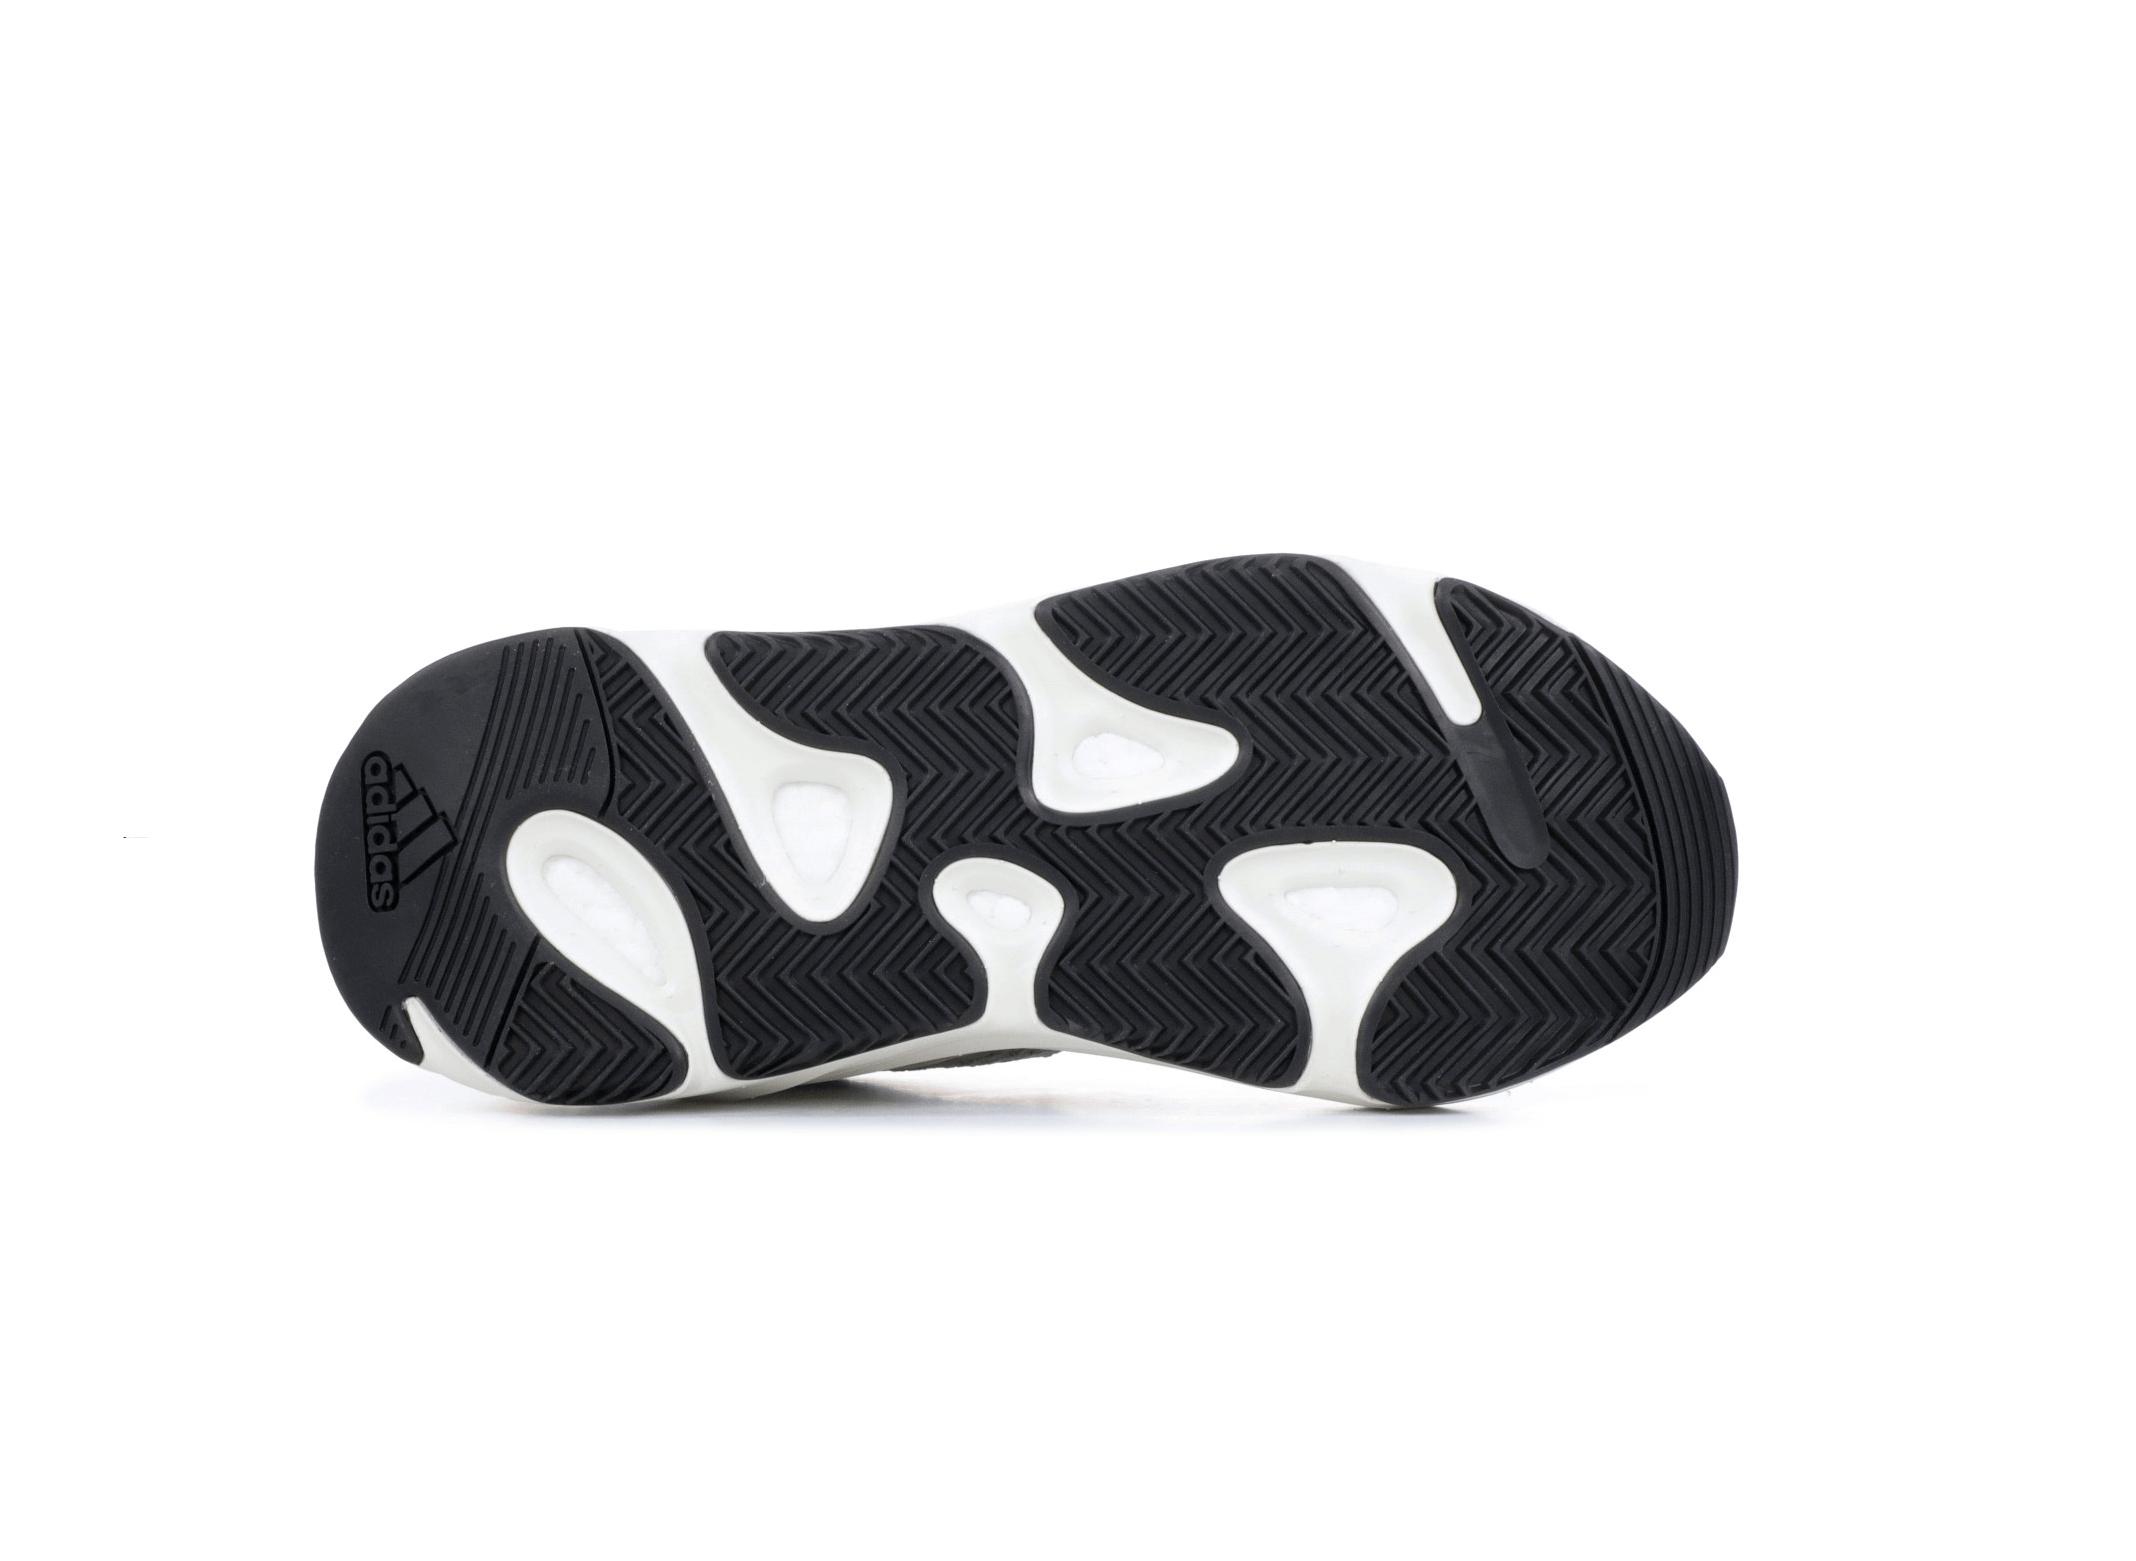 519e731a0 Adidas Yeezy Boost 700 V2 Static – Kerimago